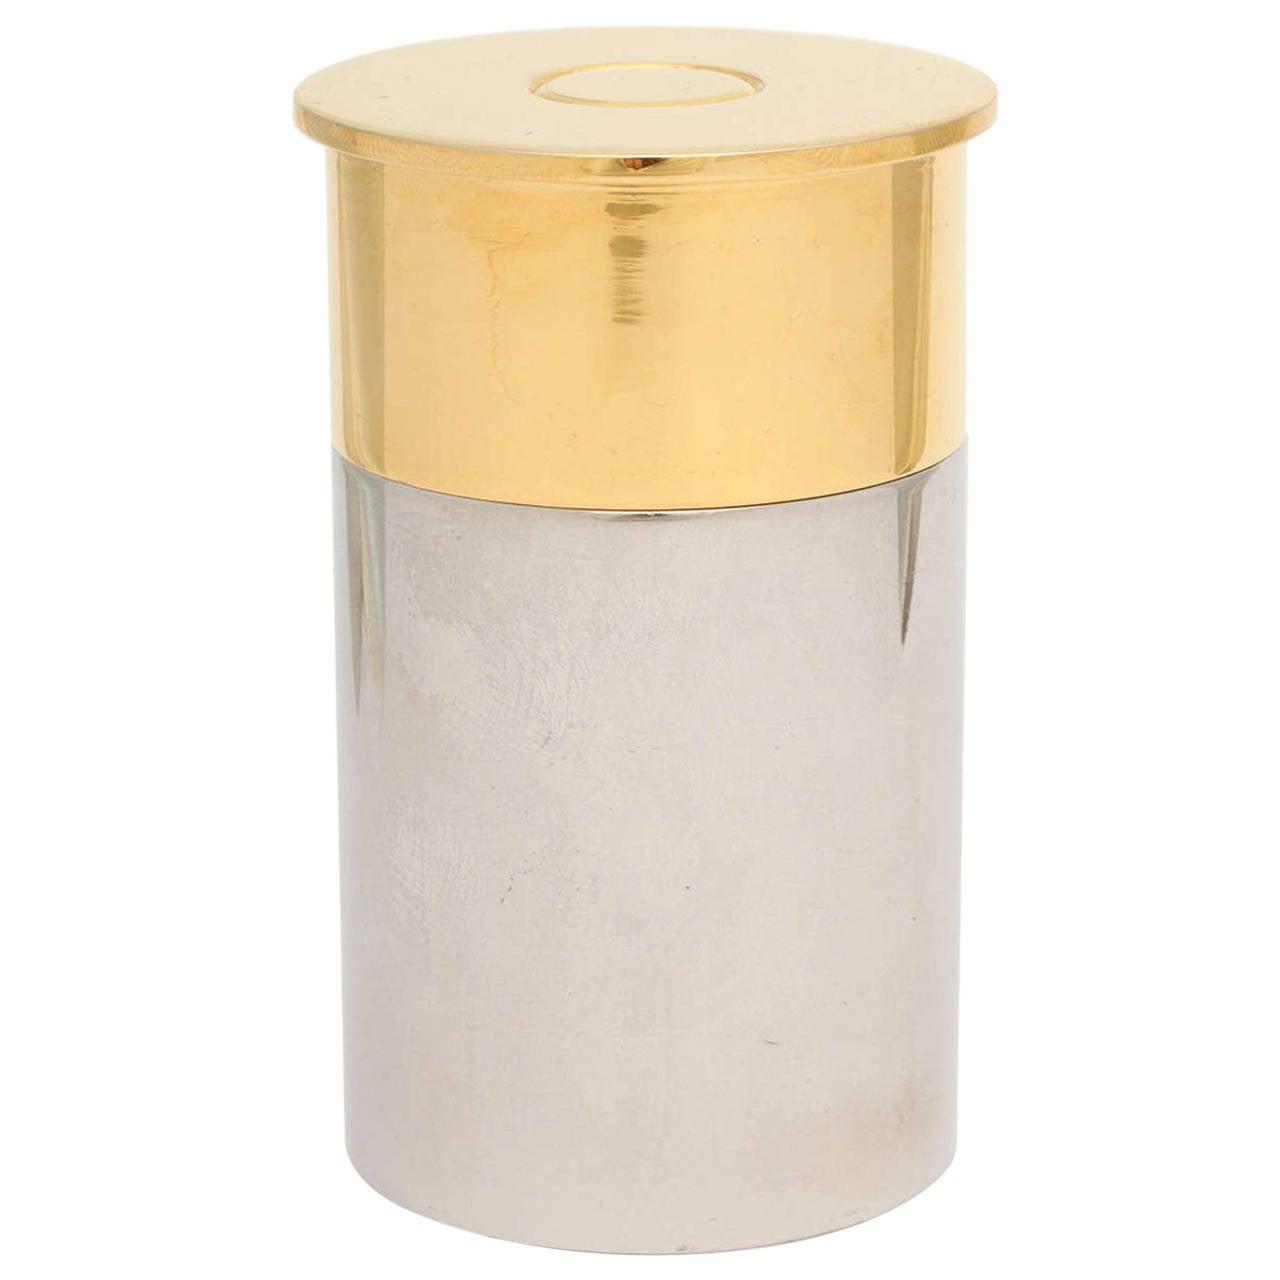 Hermès Coffee Table Cigarette Lighter At 1stdibs